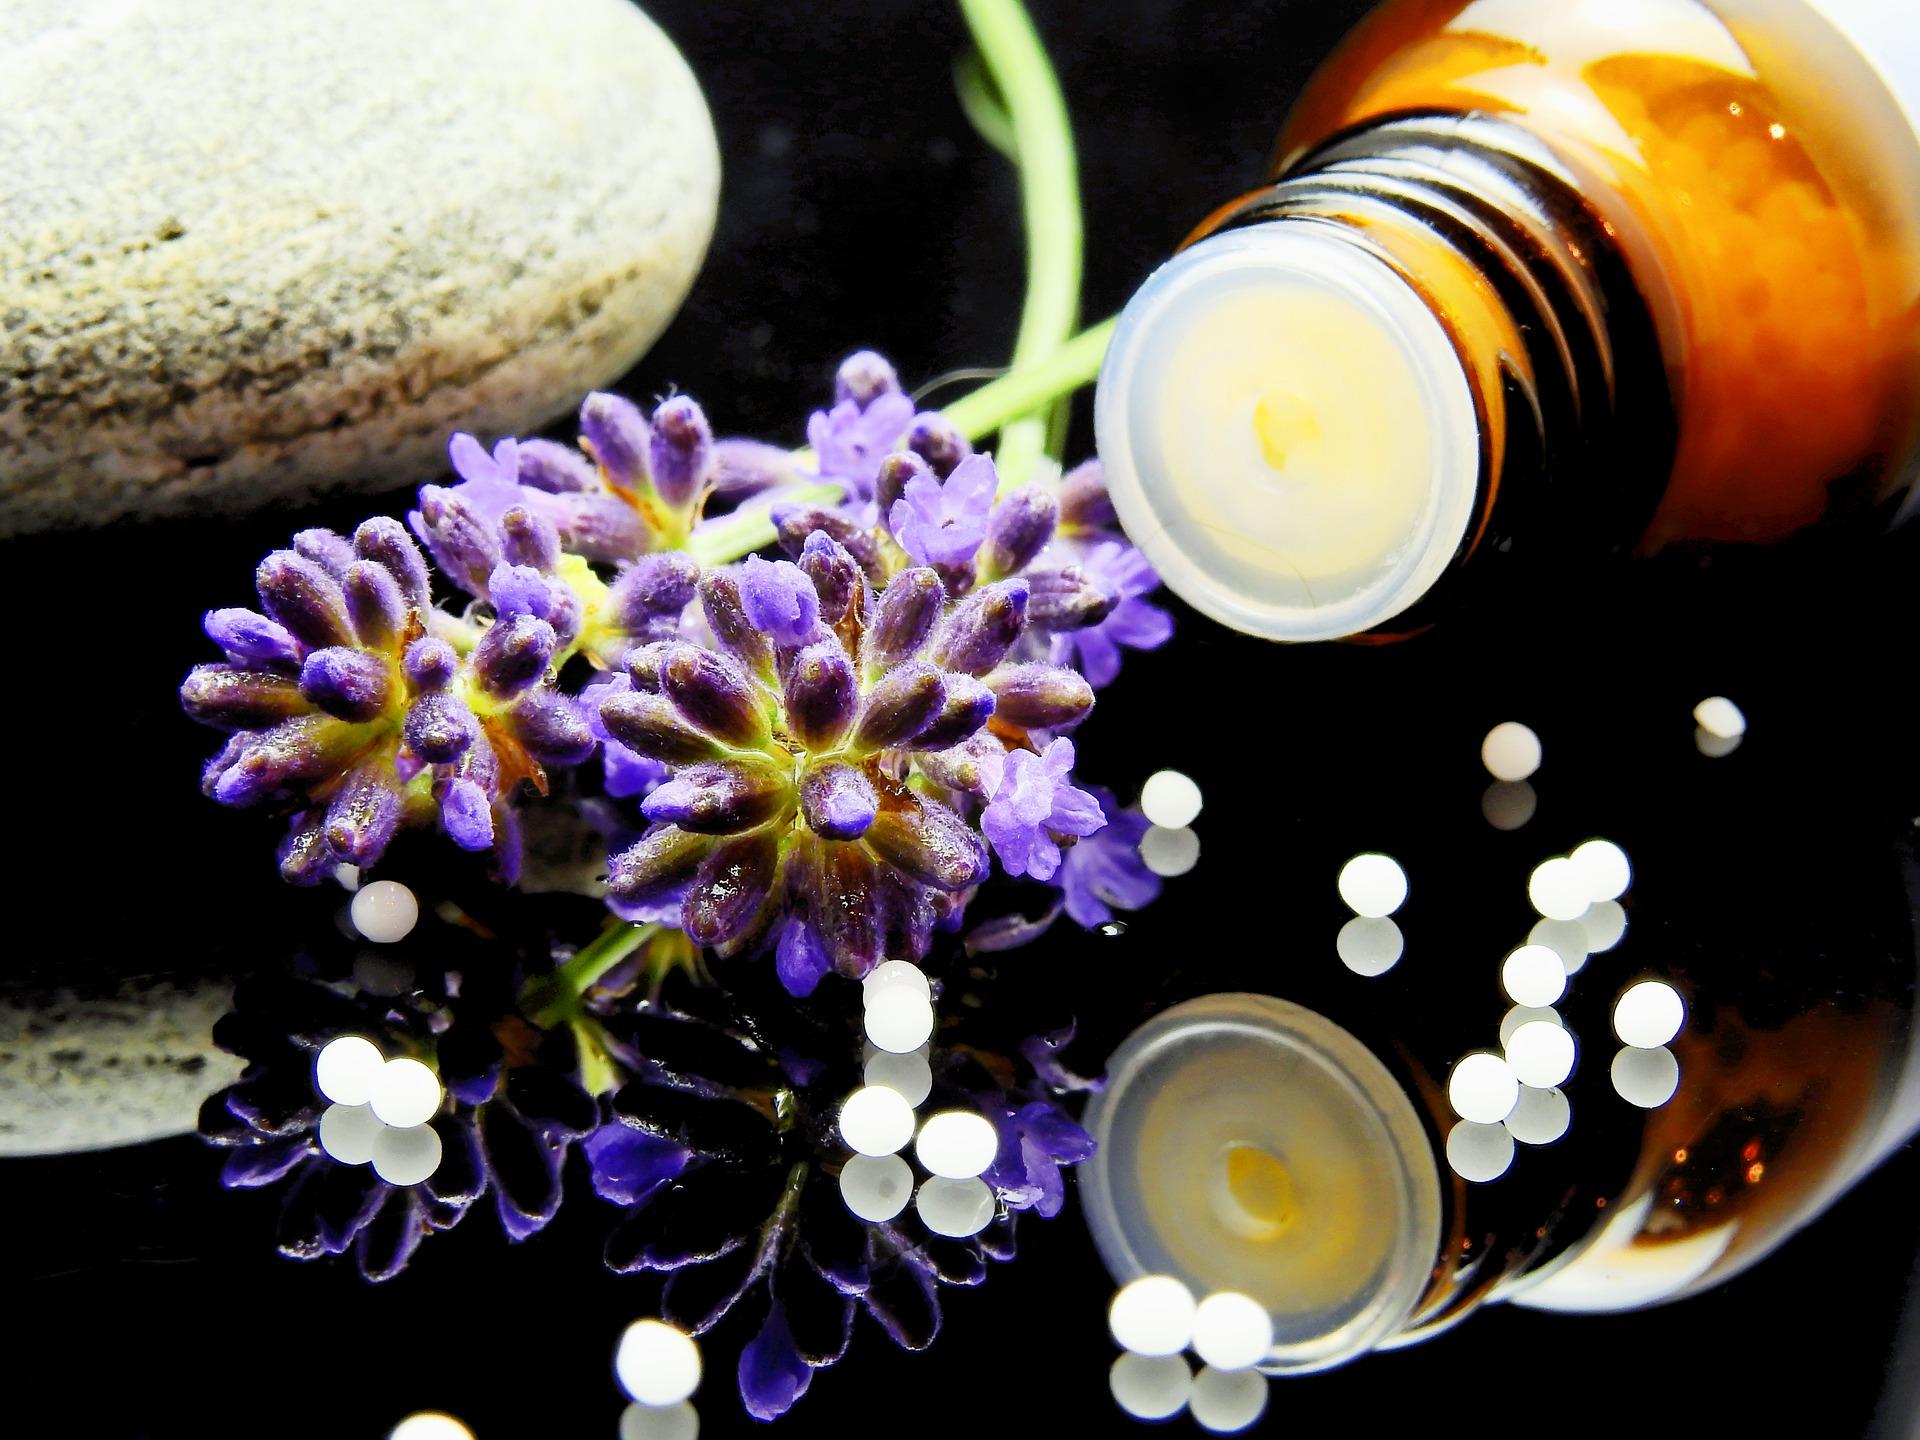 fibromyalgie en natuurgeneeskunde